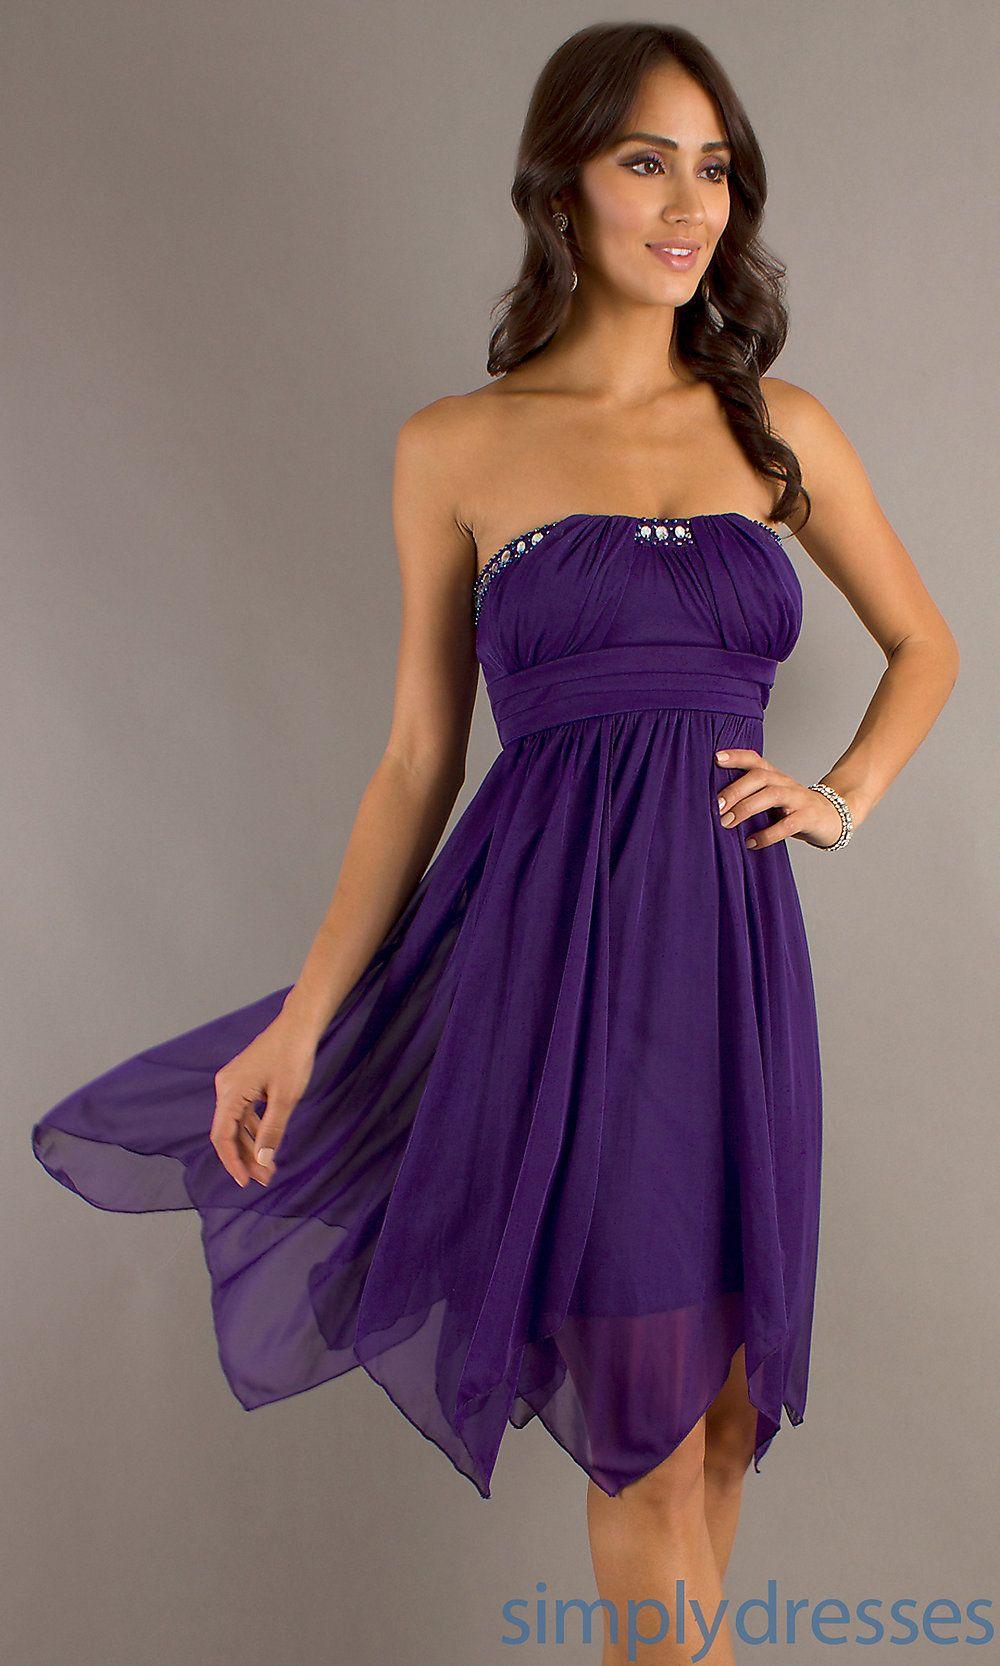 Strapless purple short dress purple party dress simply dresses strapless purple short dress purple party dress simply dresses ombrellifo Image collections